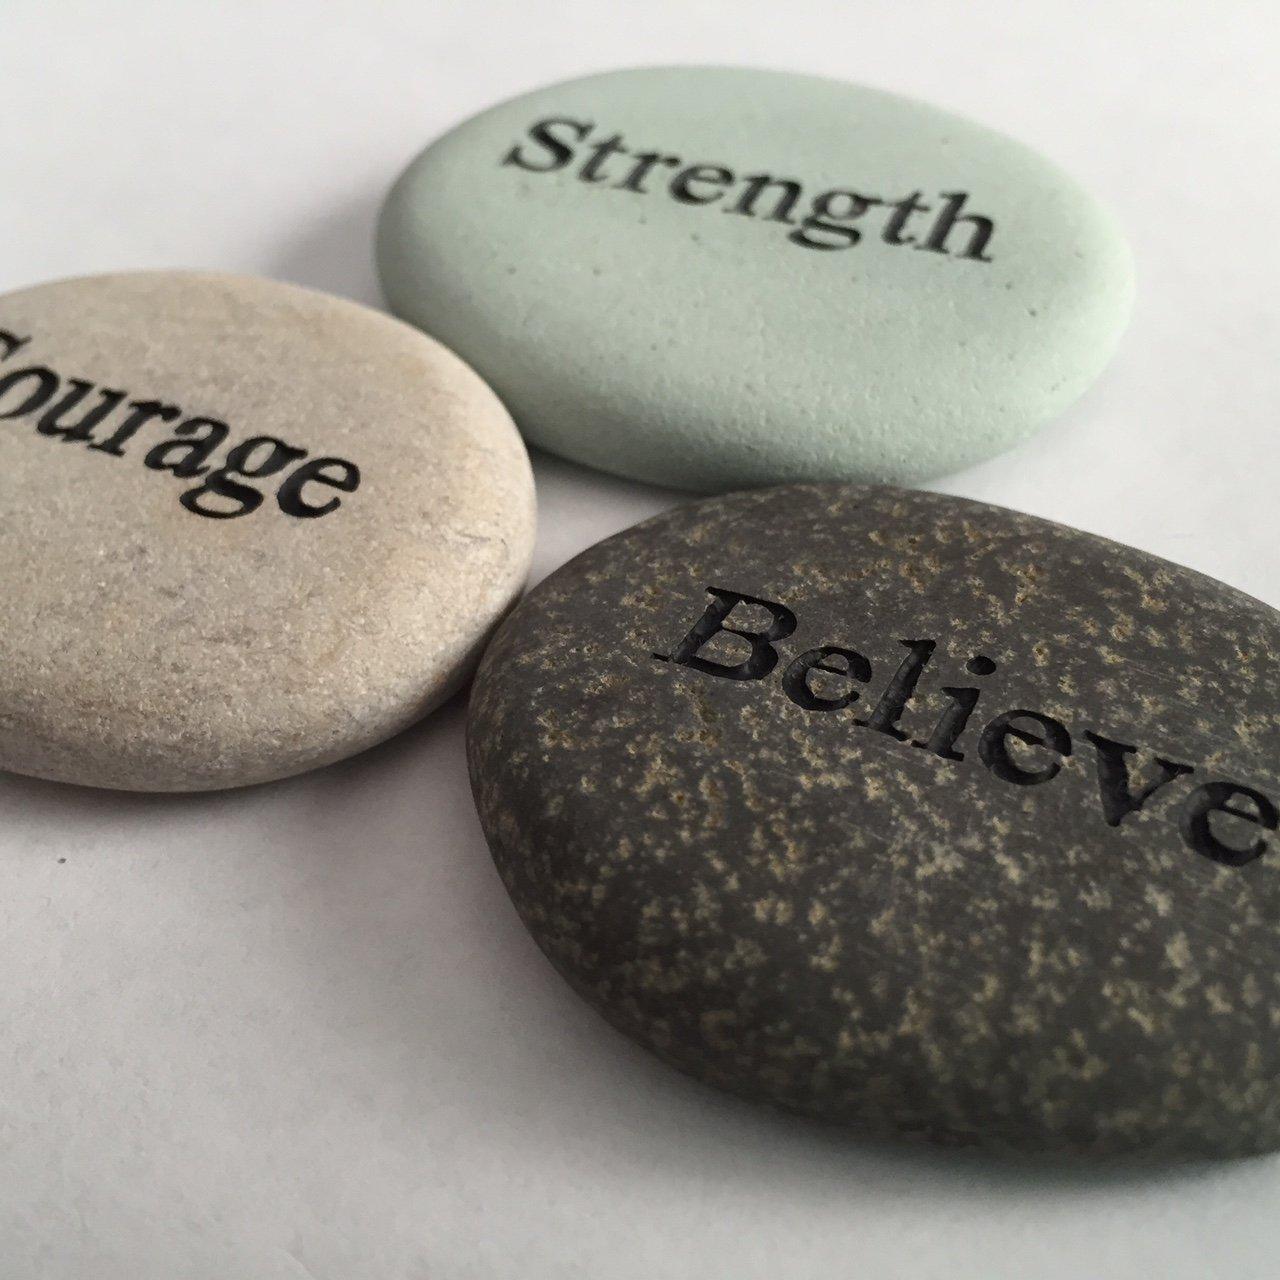 Courage Strength Believe Engraved Stones - 3 Stone Set